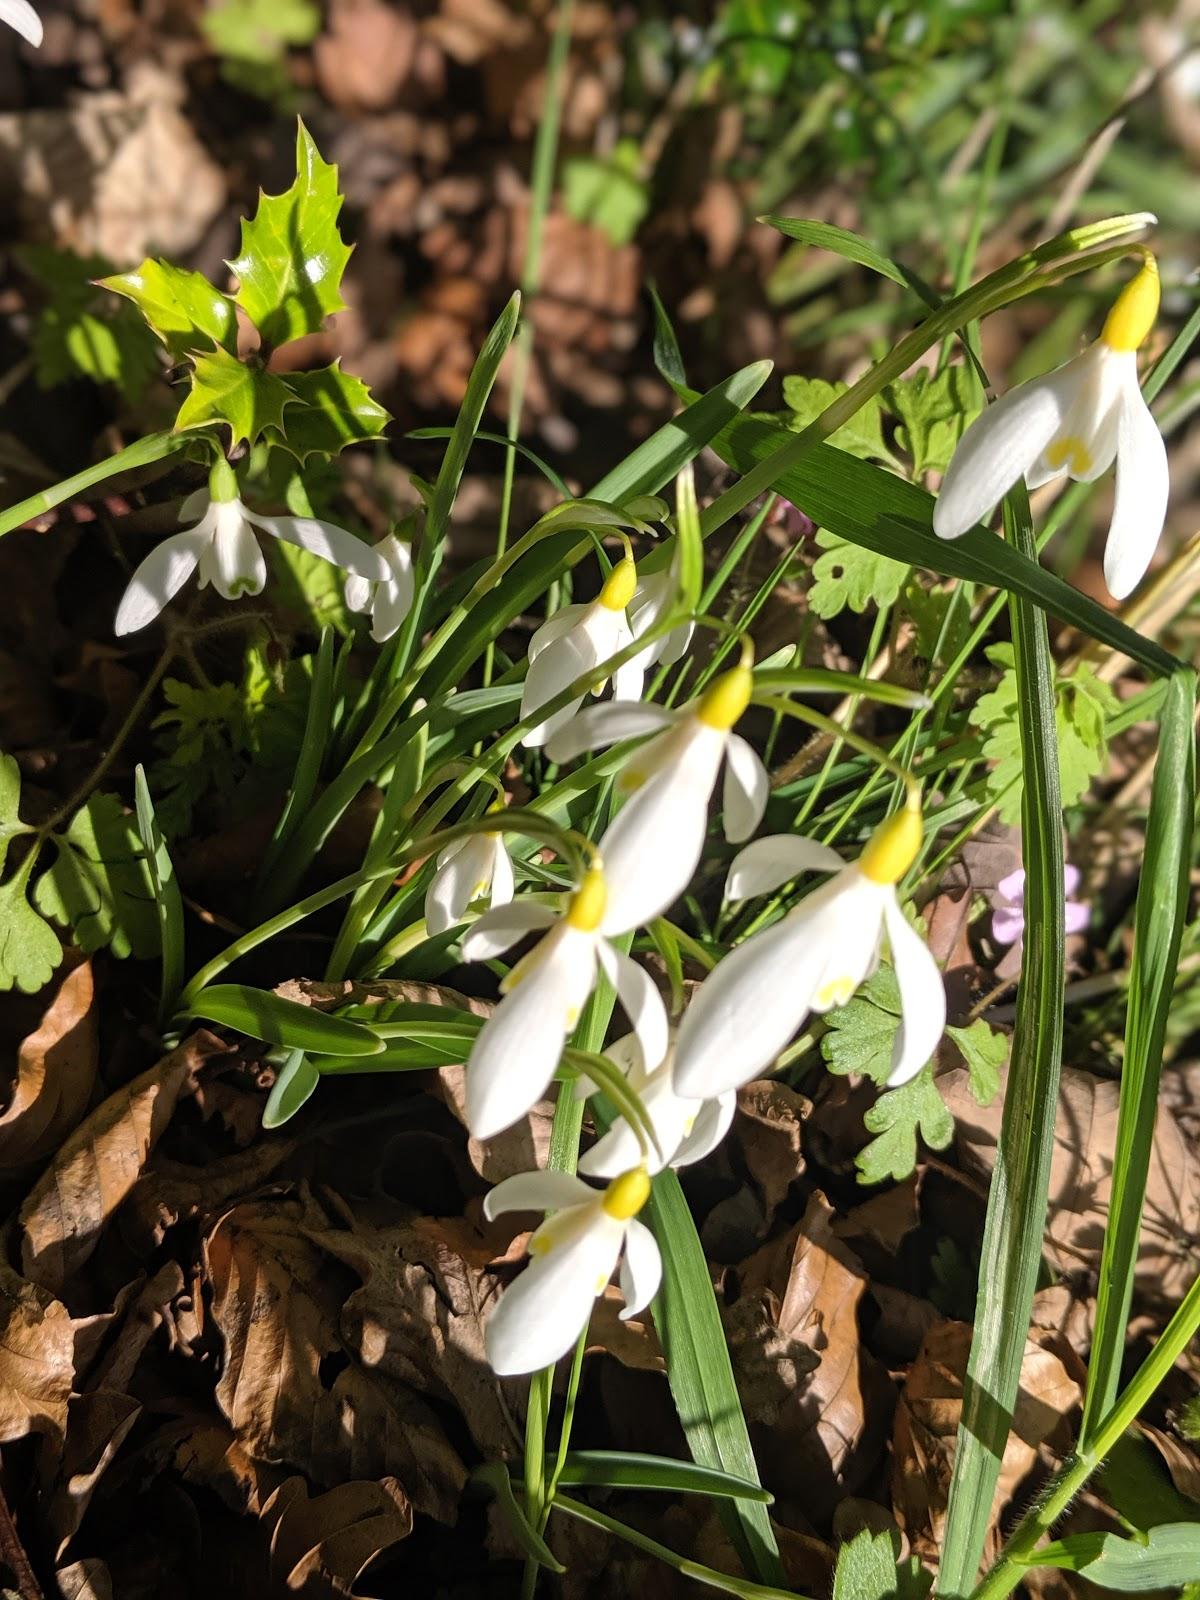 Howick Hall Snowdrop Walk & Sensory Garden - Yellow Howick Snowdrops